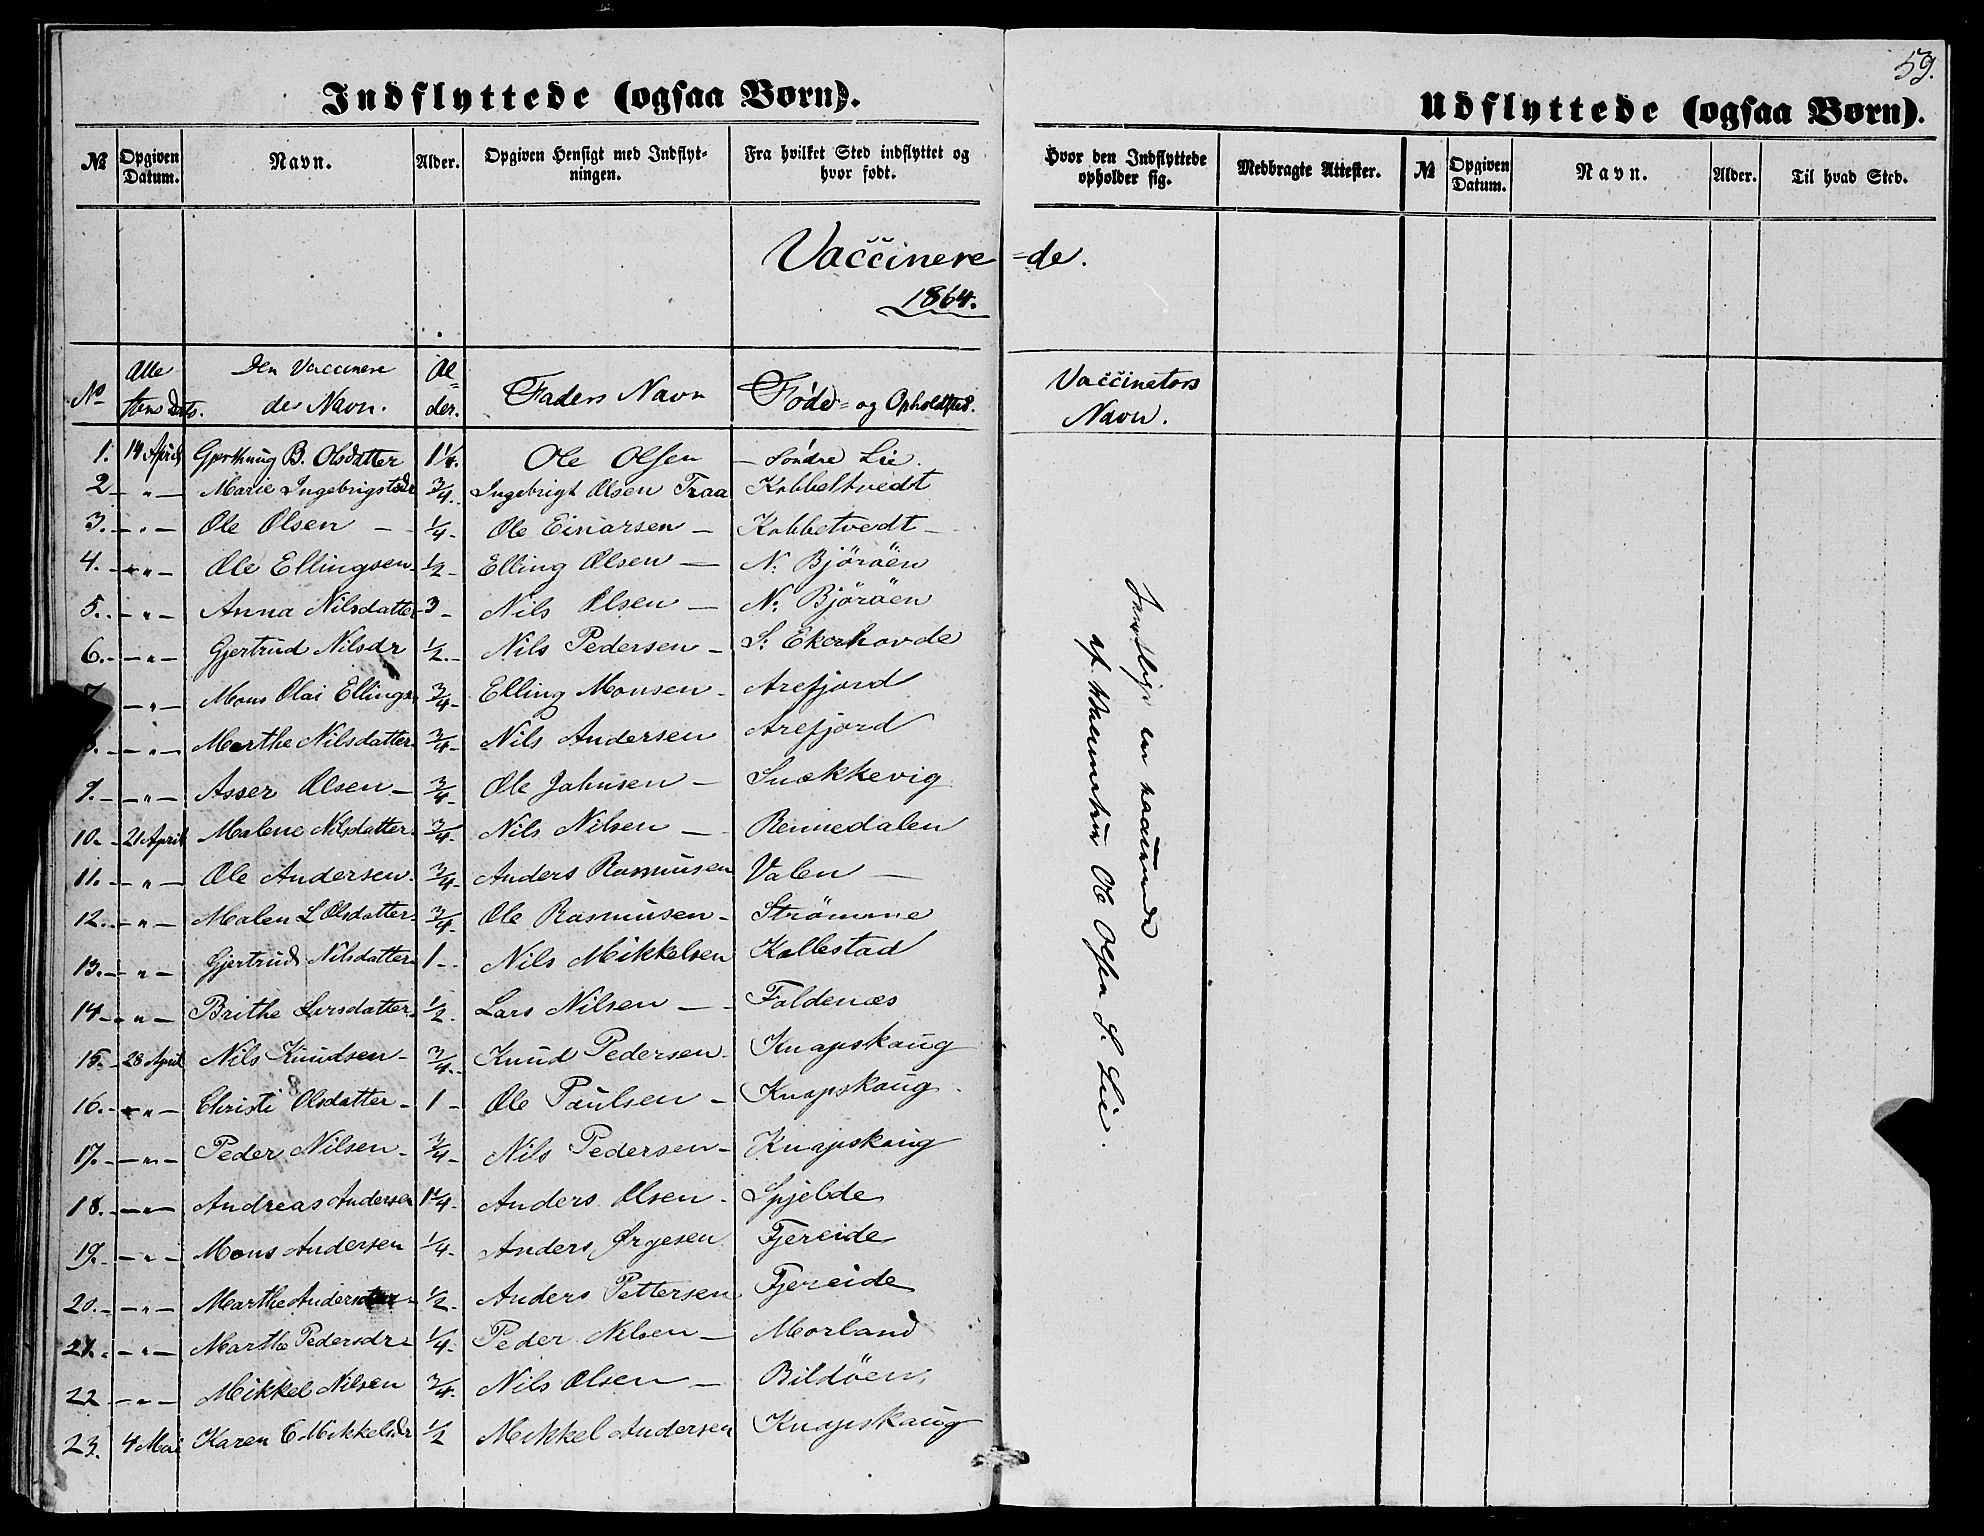 SAB, Fjell sokneprestembete, H/Haa: Parish register (official) no. A 4, 1851-1870, p. 59